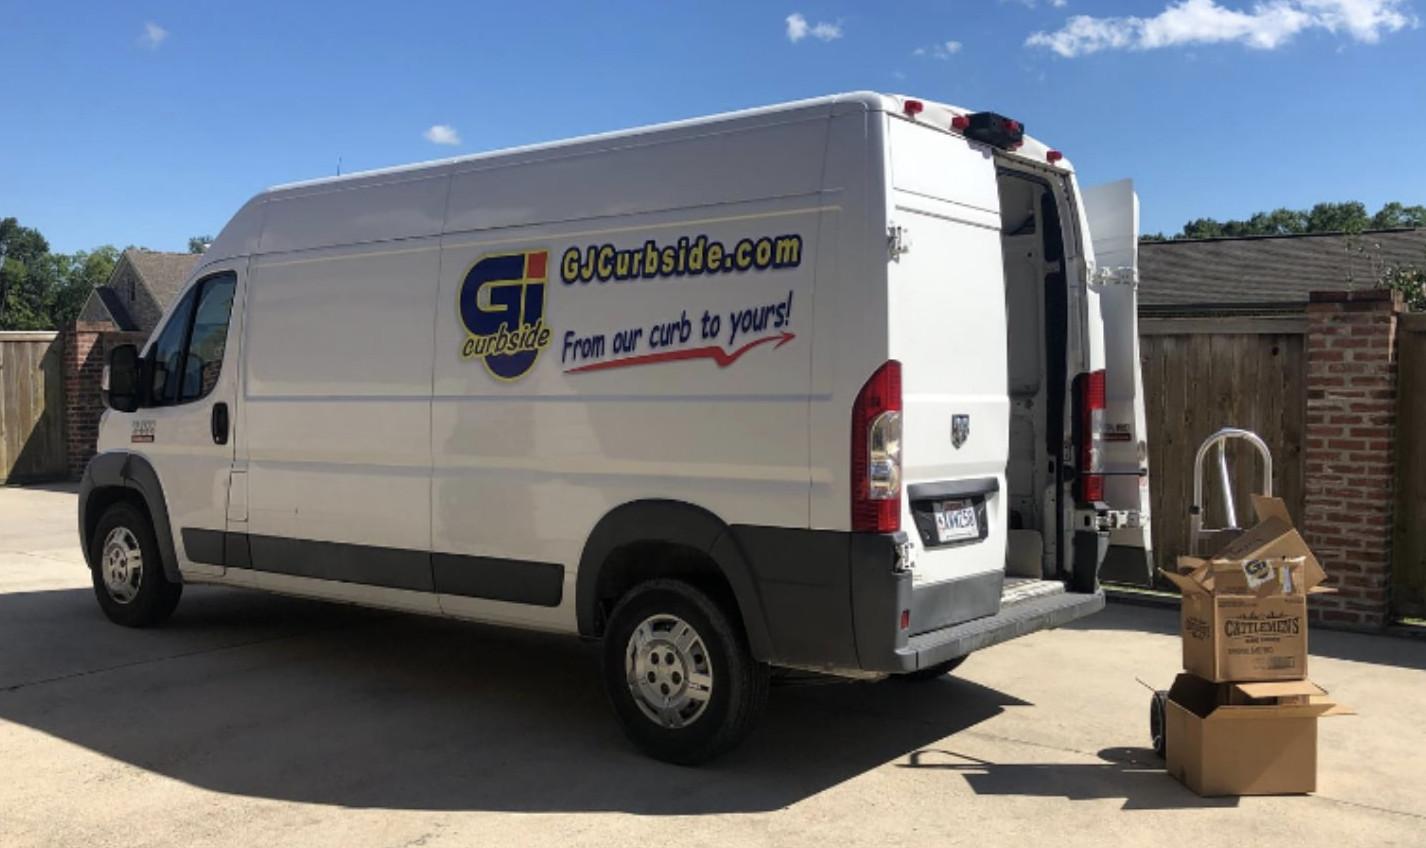 Curbside Sanitizer Kit - GJ Curbside